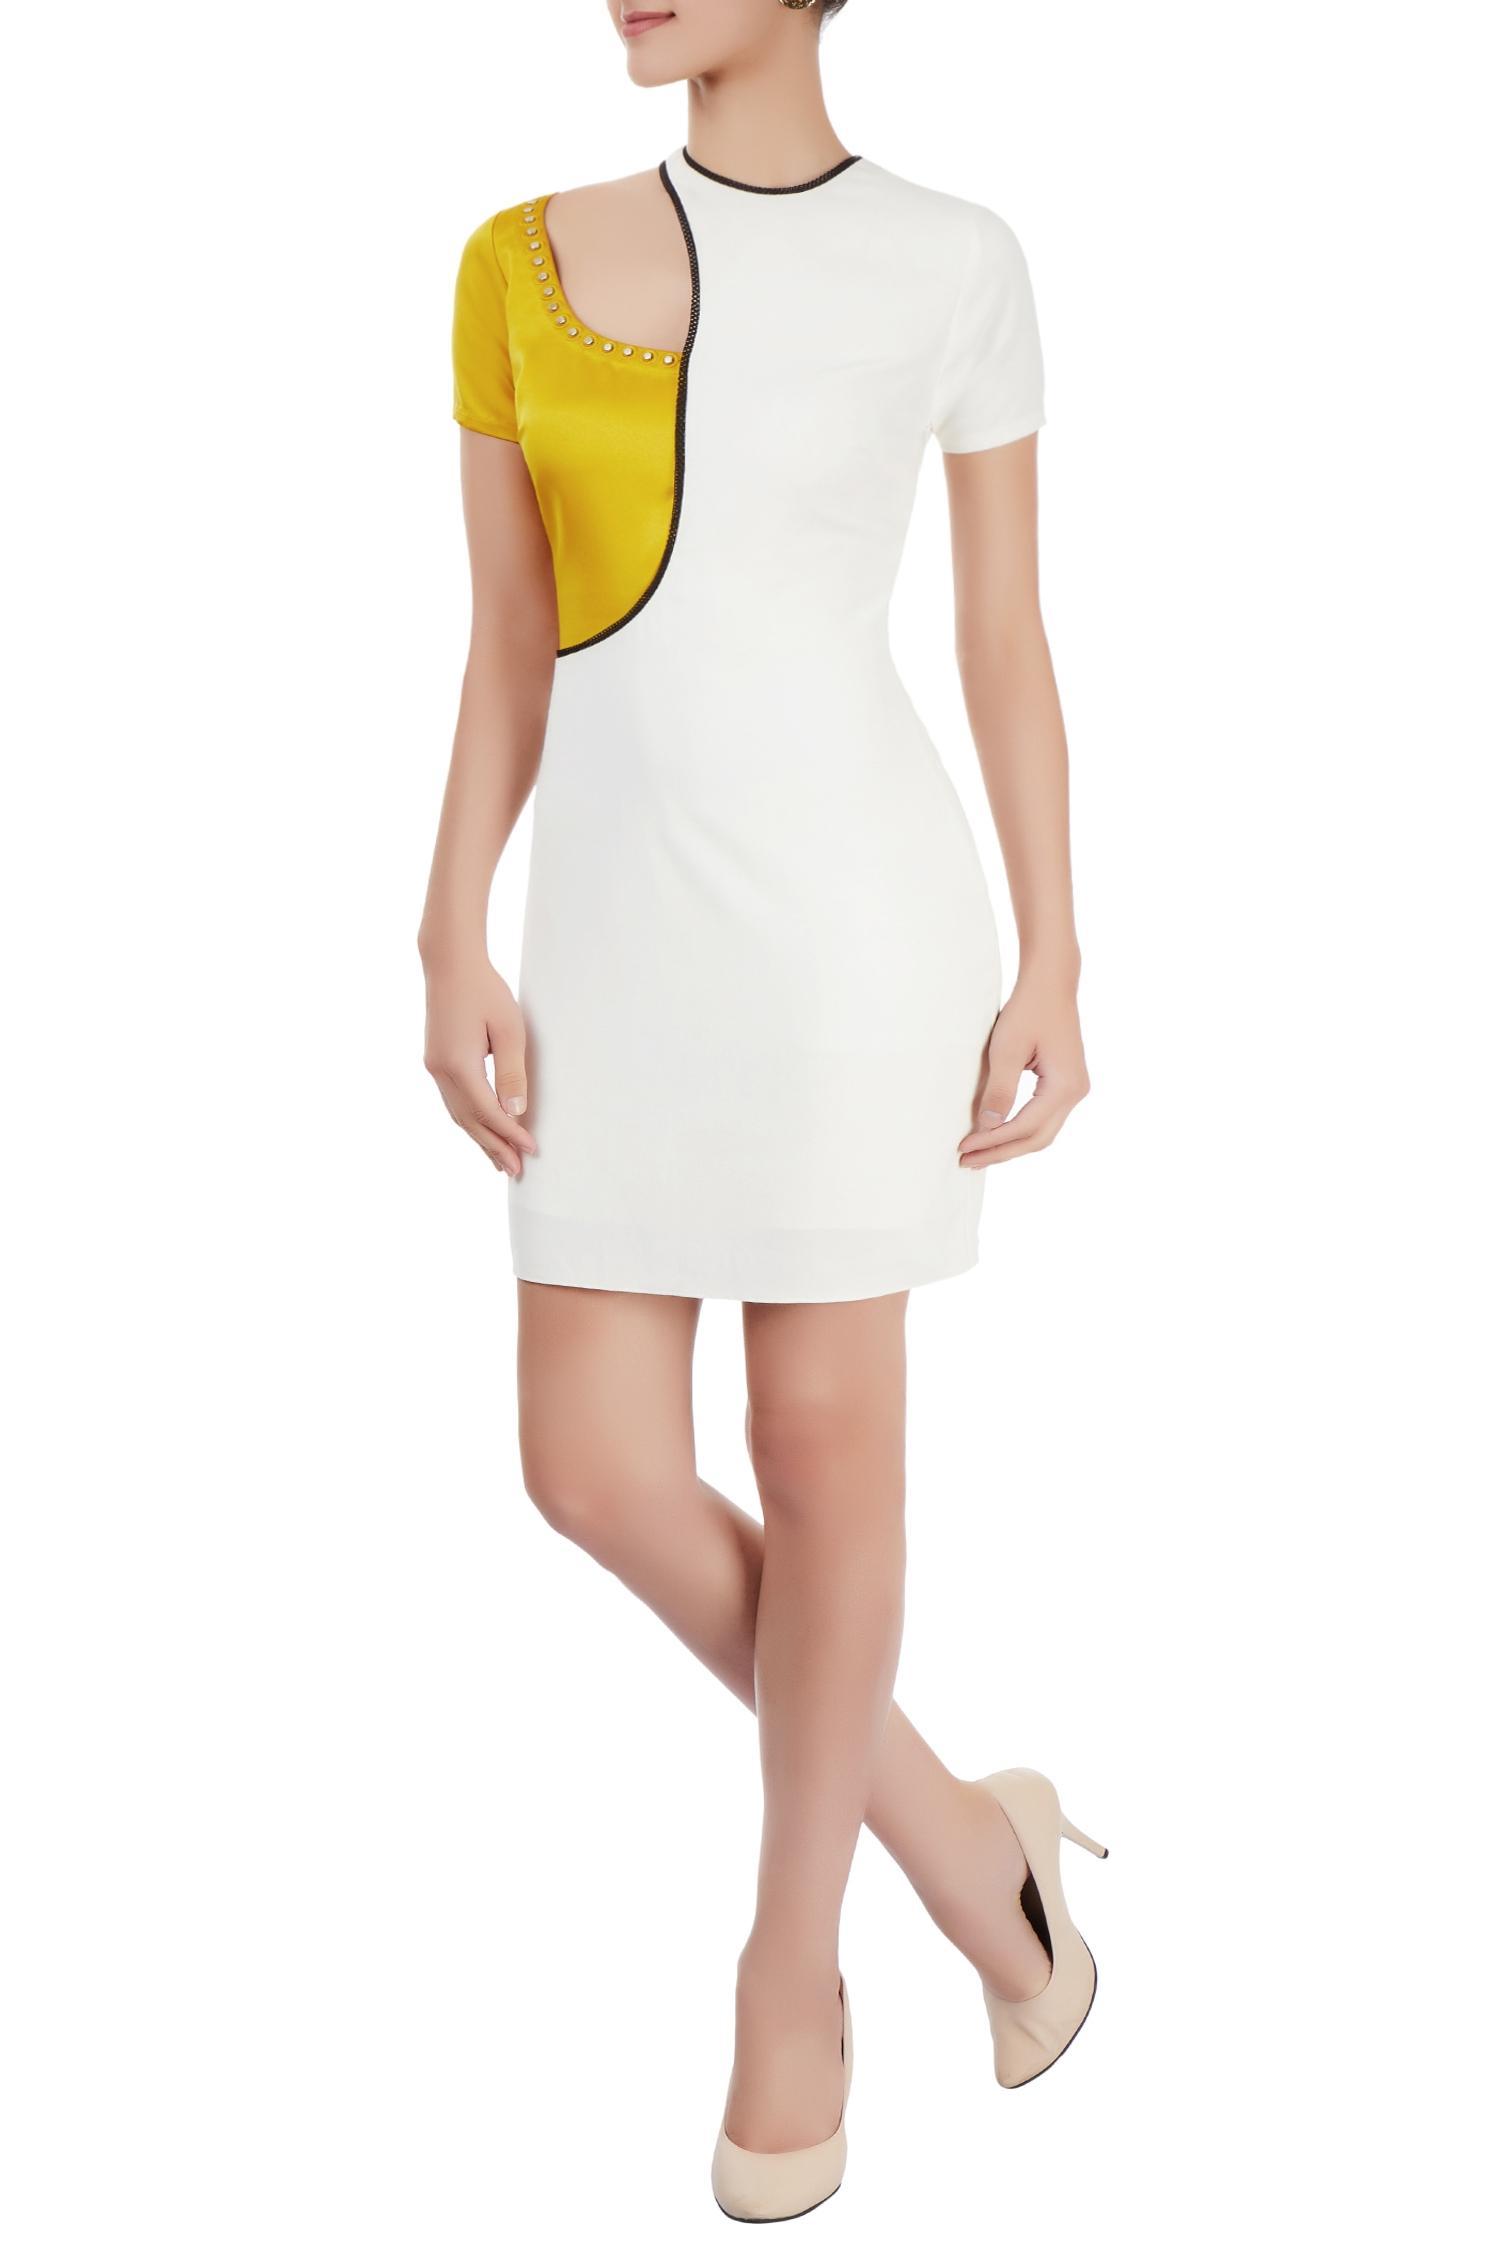 Buy Off-white & canary yellow dress by Babita Malkani at Aza Fashions